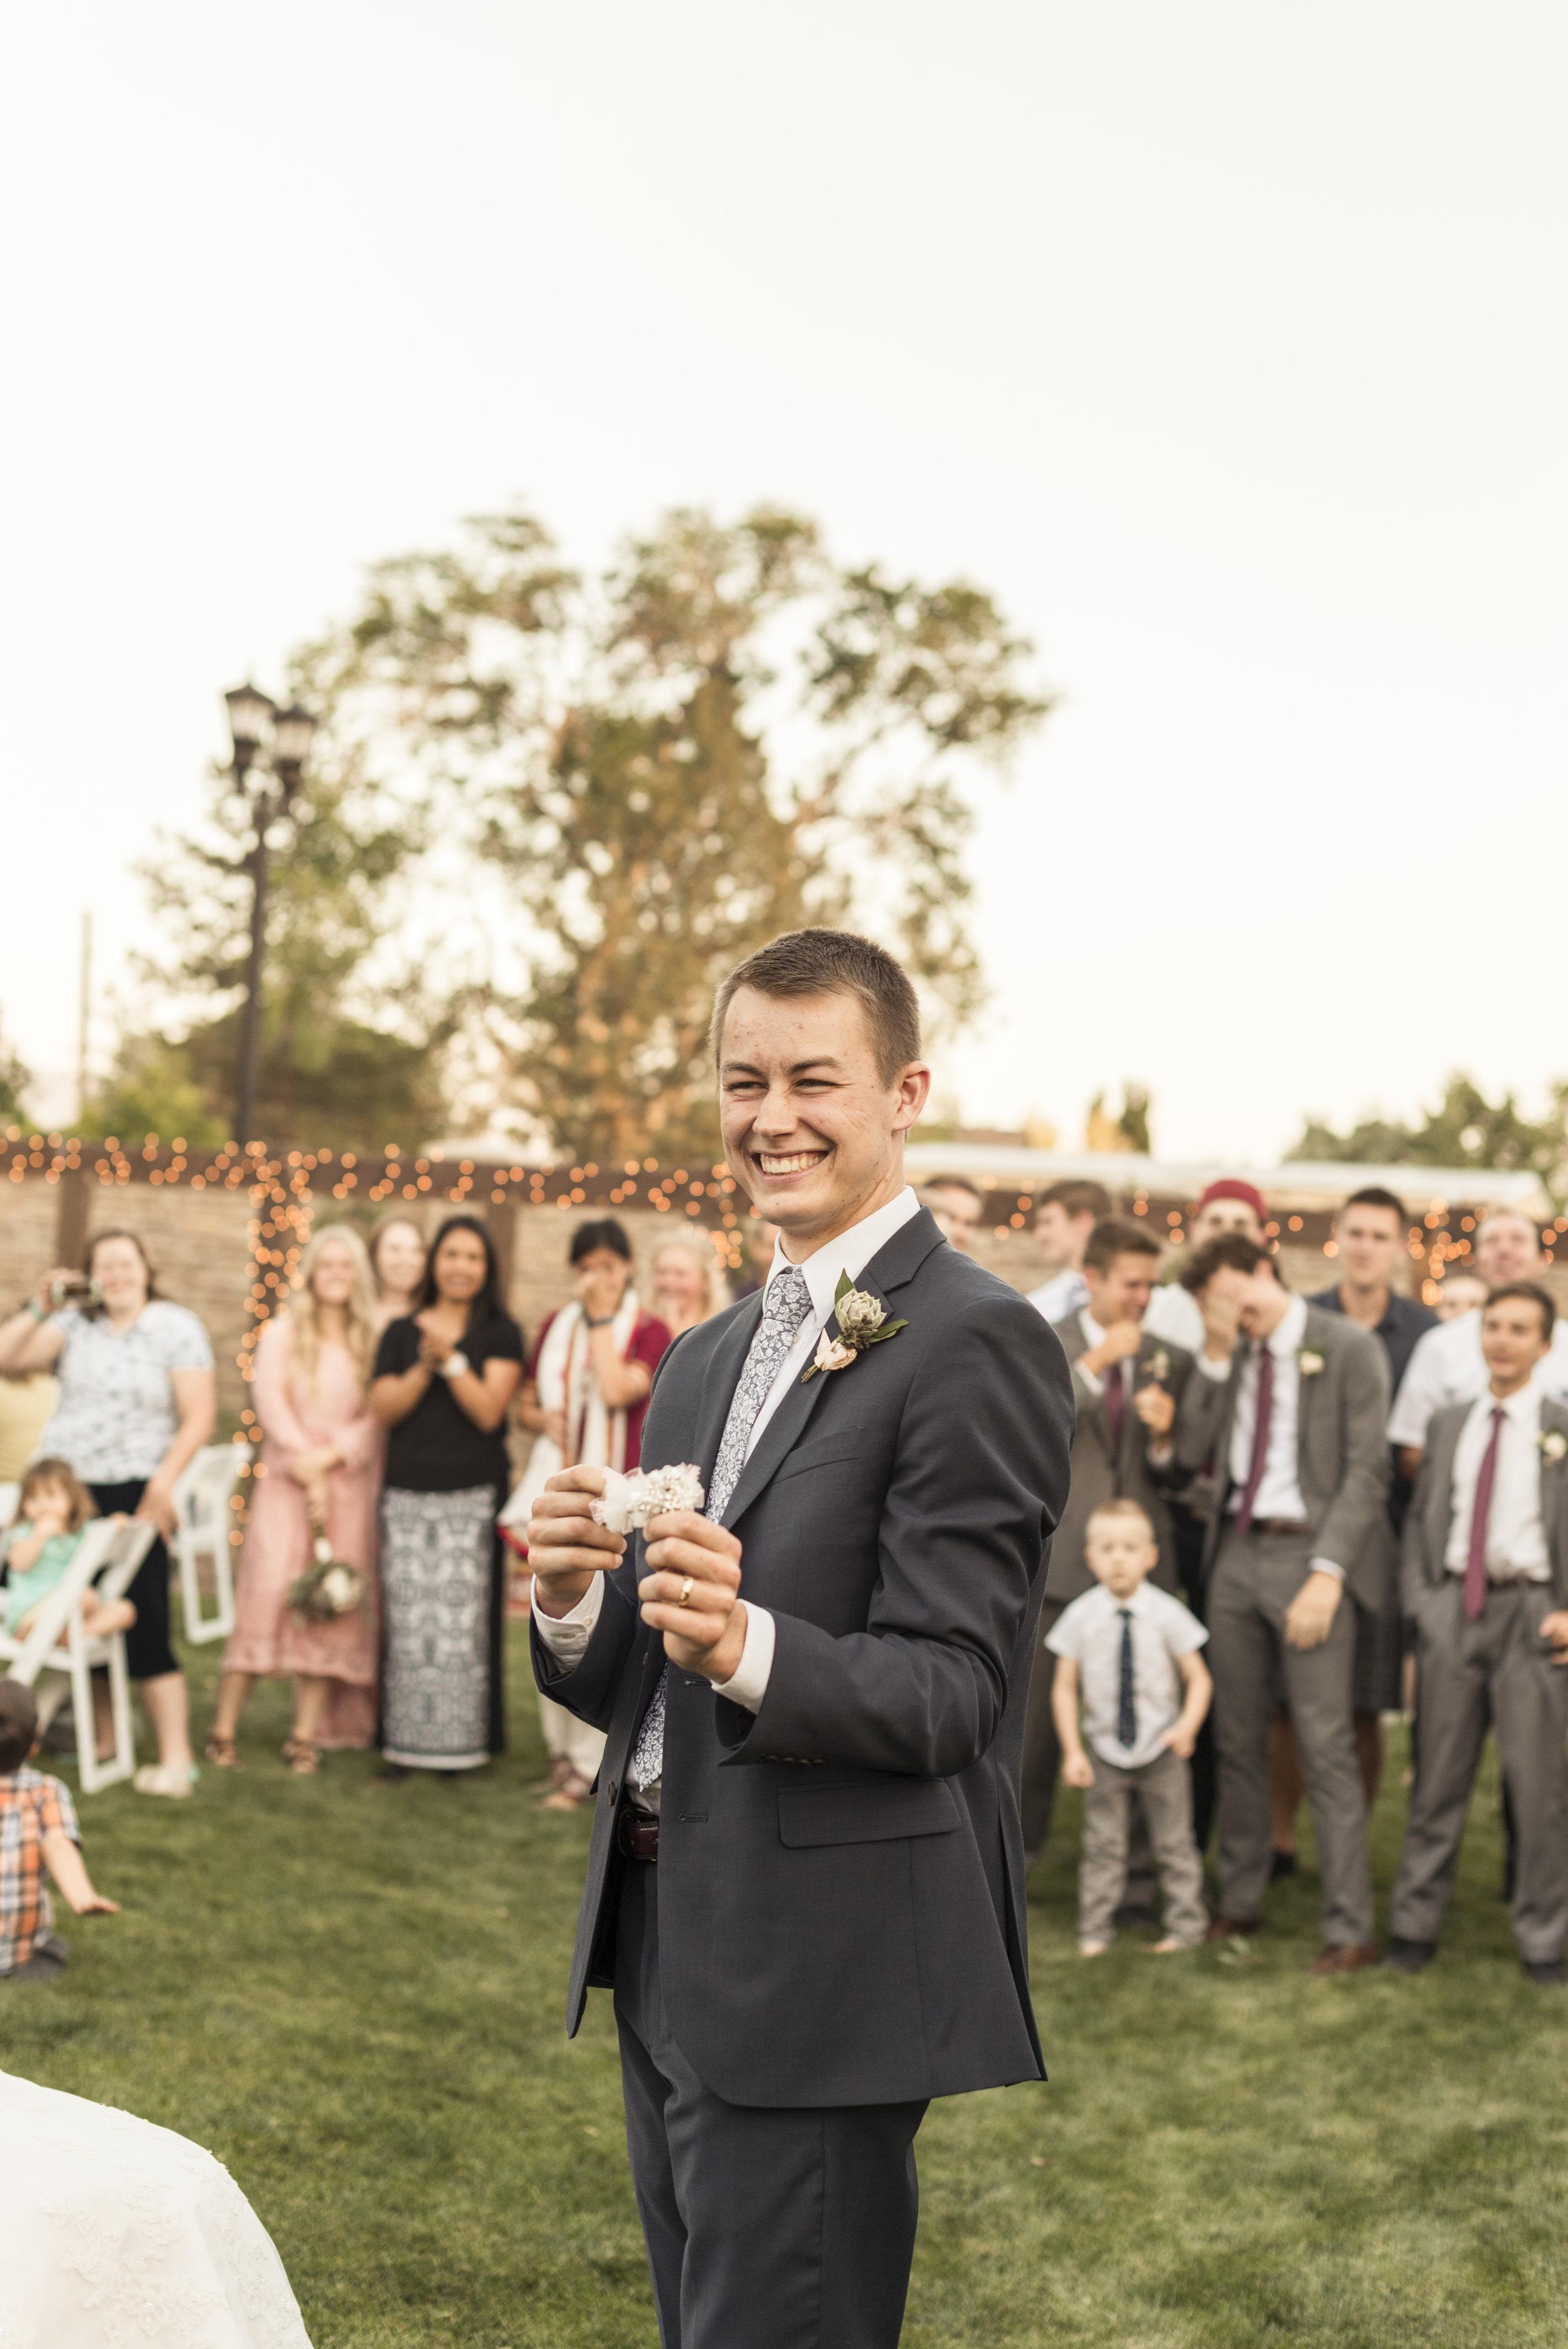 LDS Summer Wedding | South Jordan, Utah Wedding Photographer| Bri Bergman Photography 27.JPG